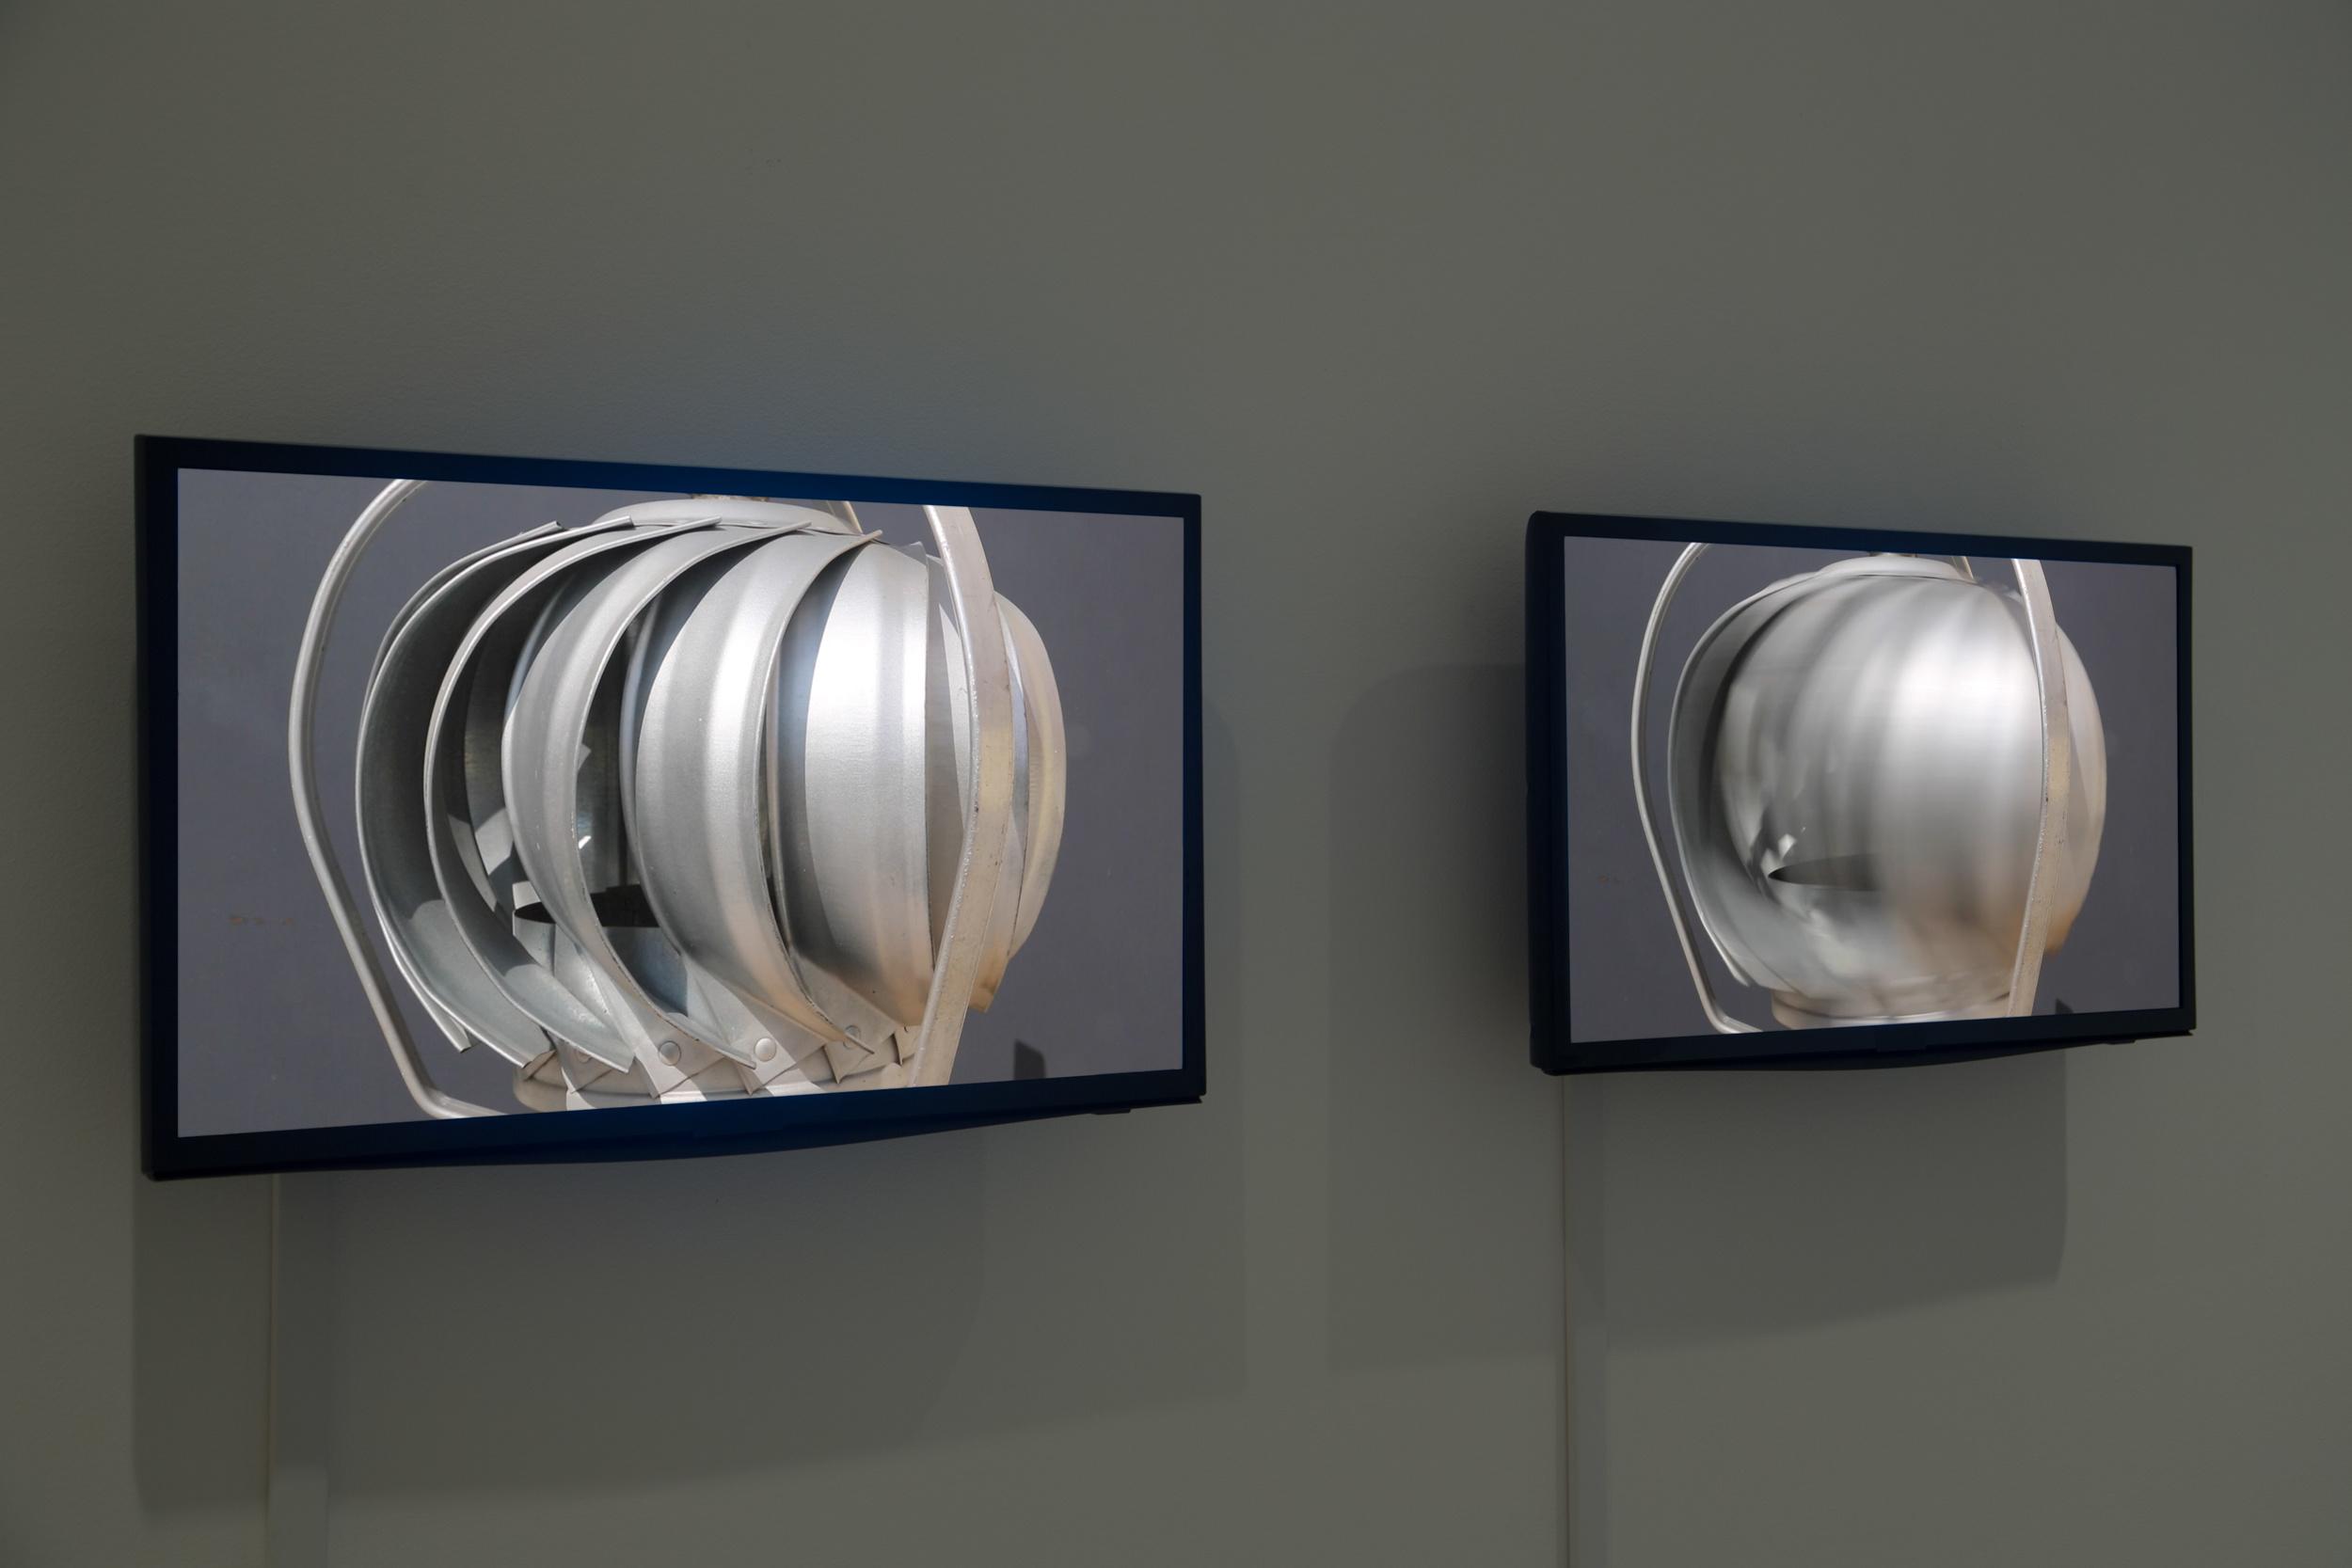 Pneumatic  , 2017  Video, flat screen monitors, industrial fans